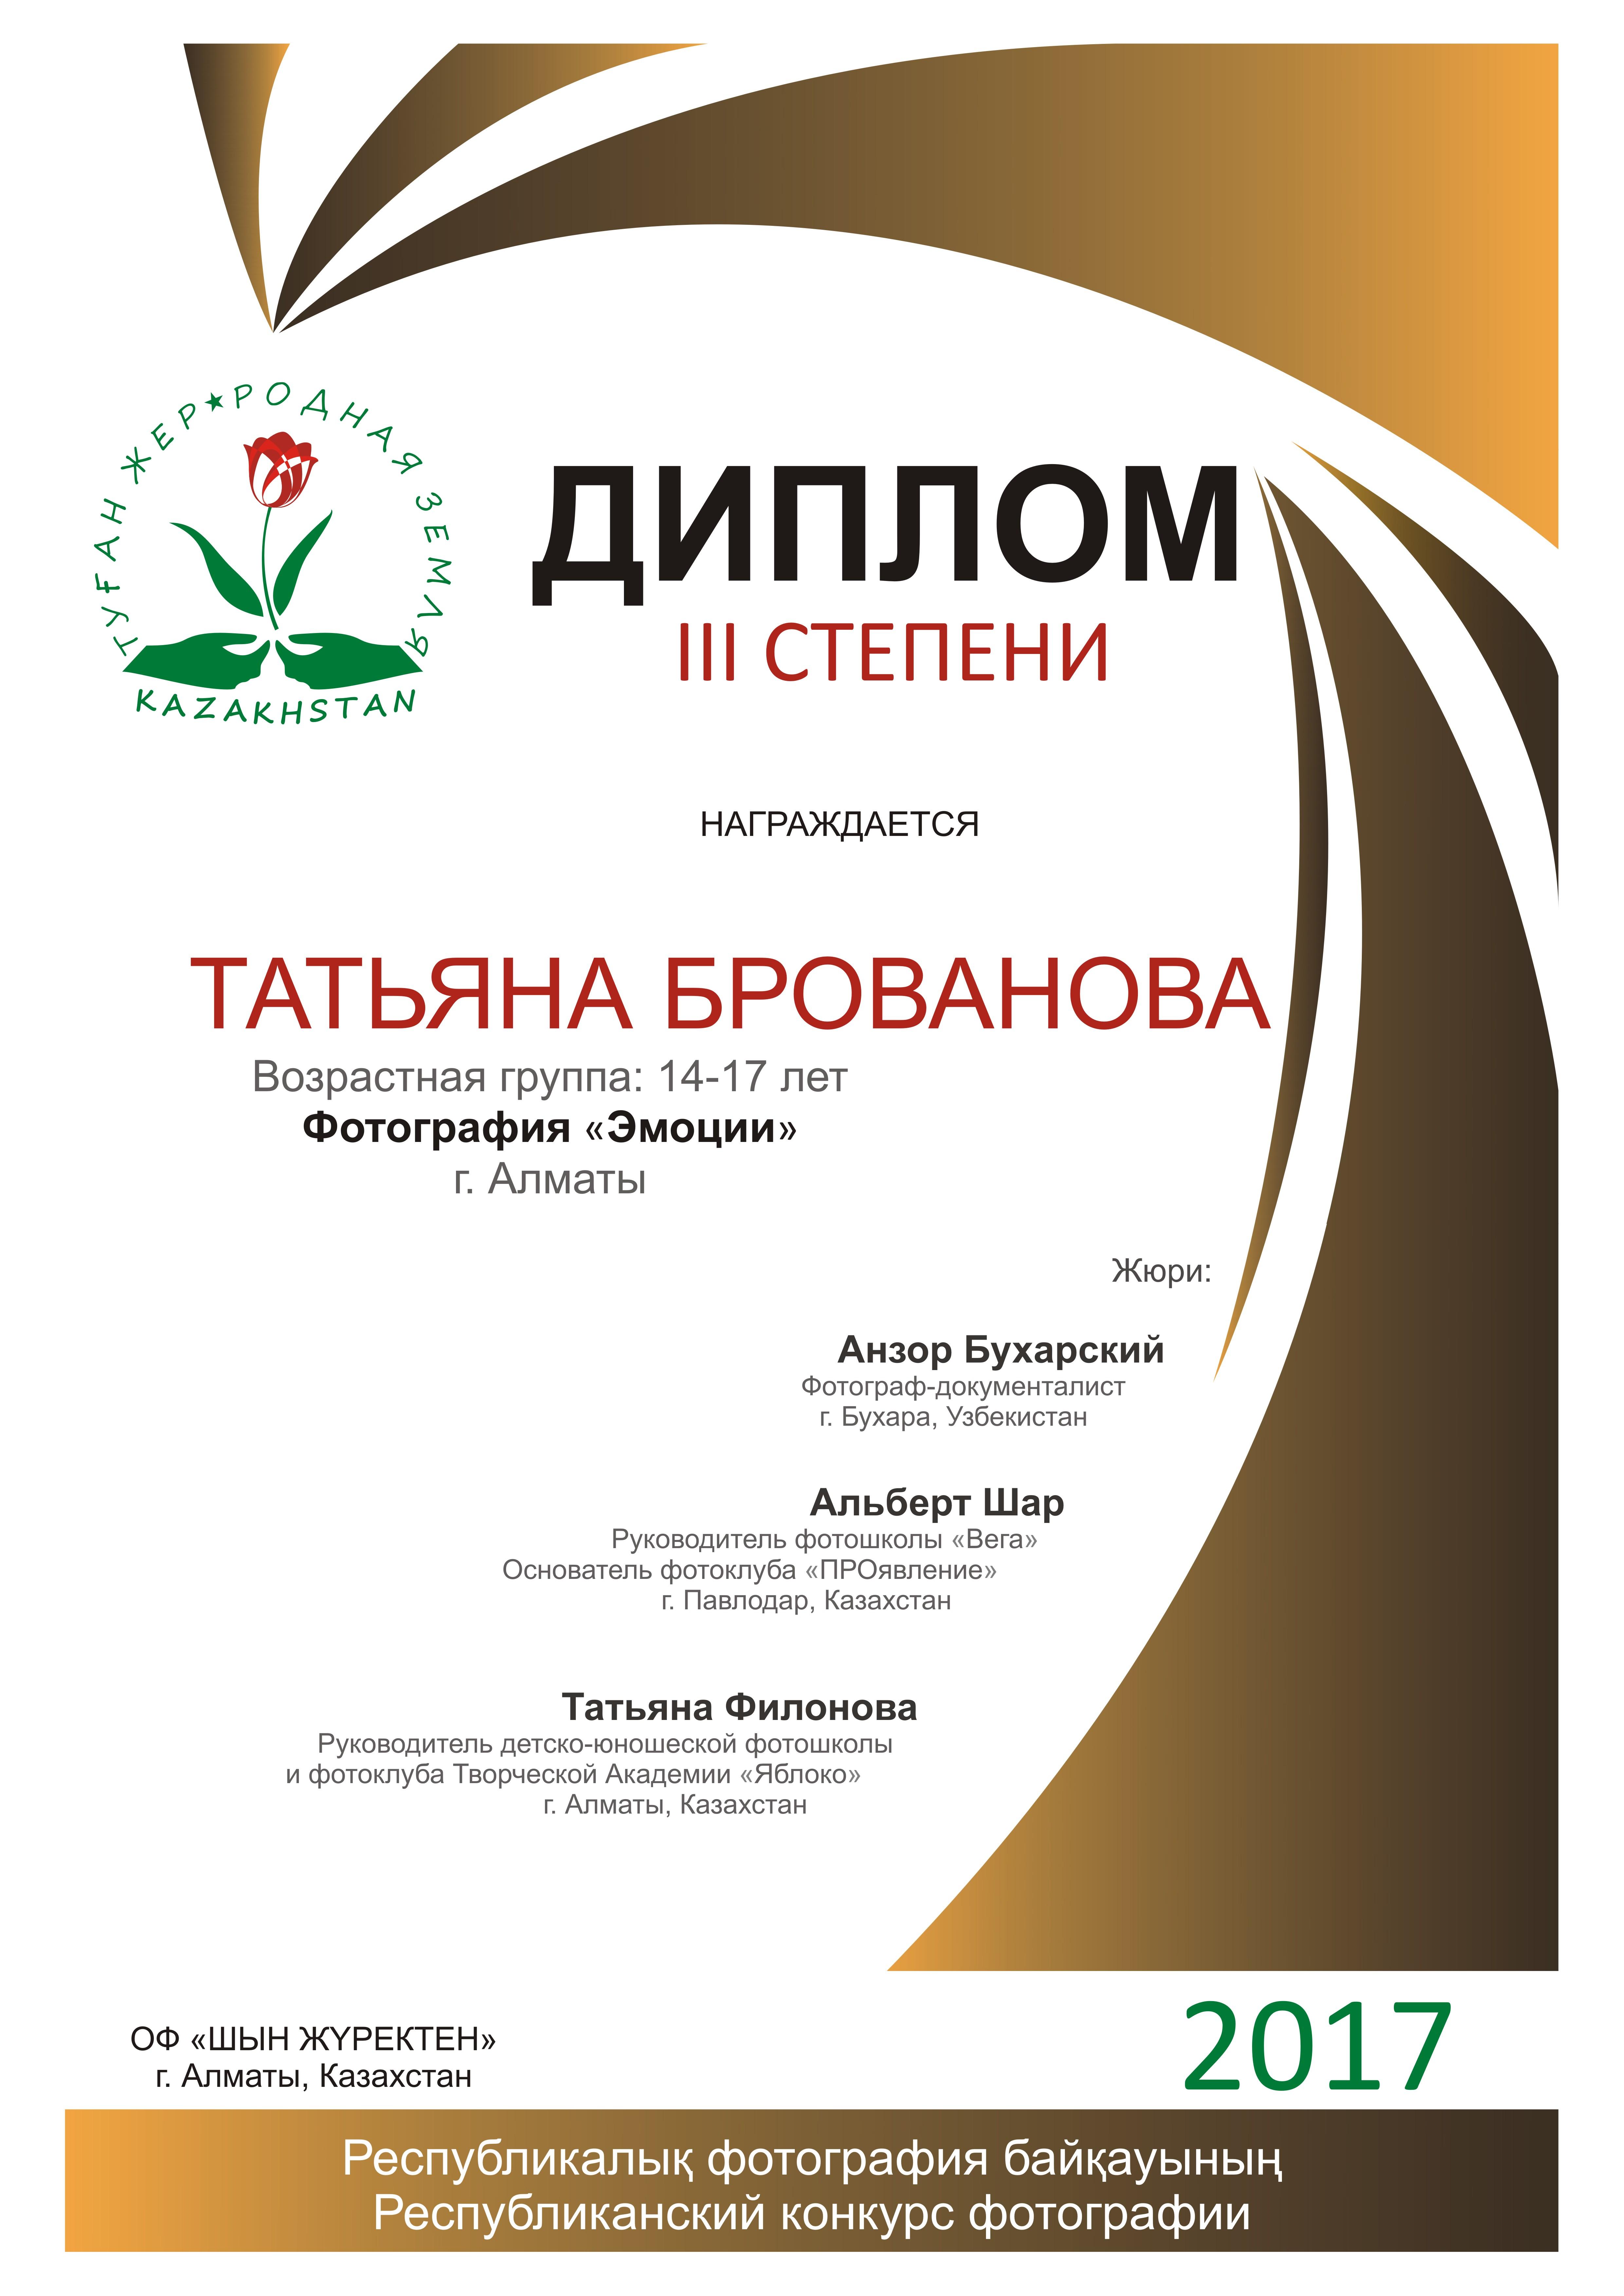 Татьяна Брованова, 14 лет